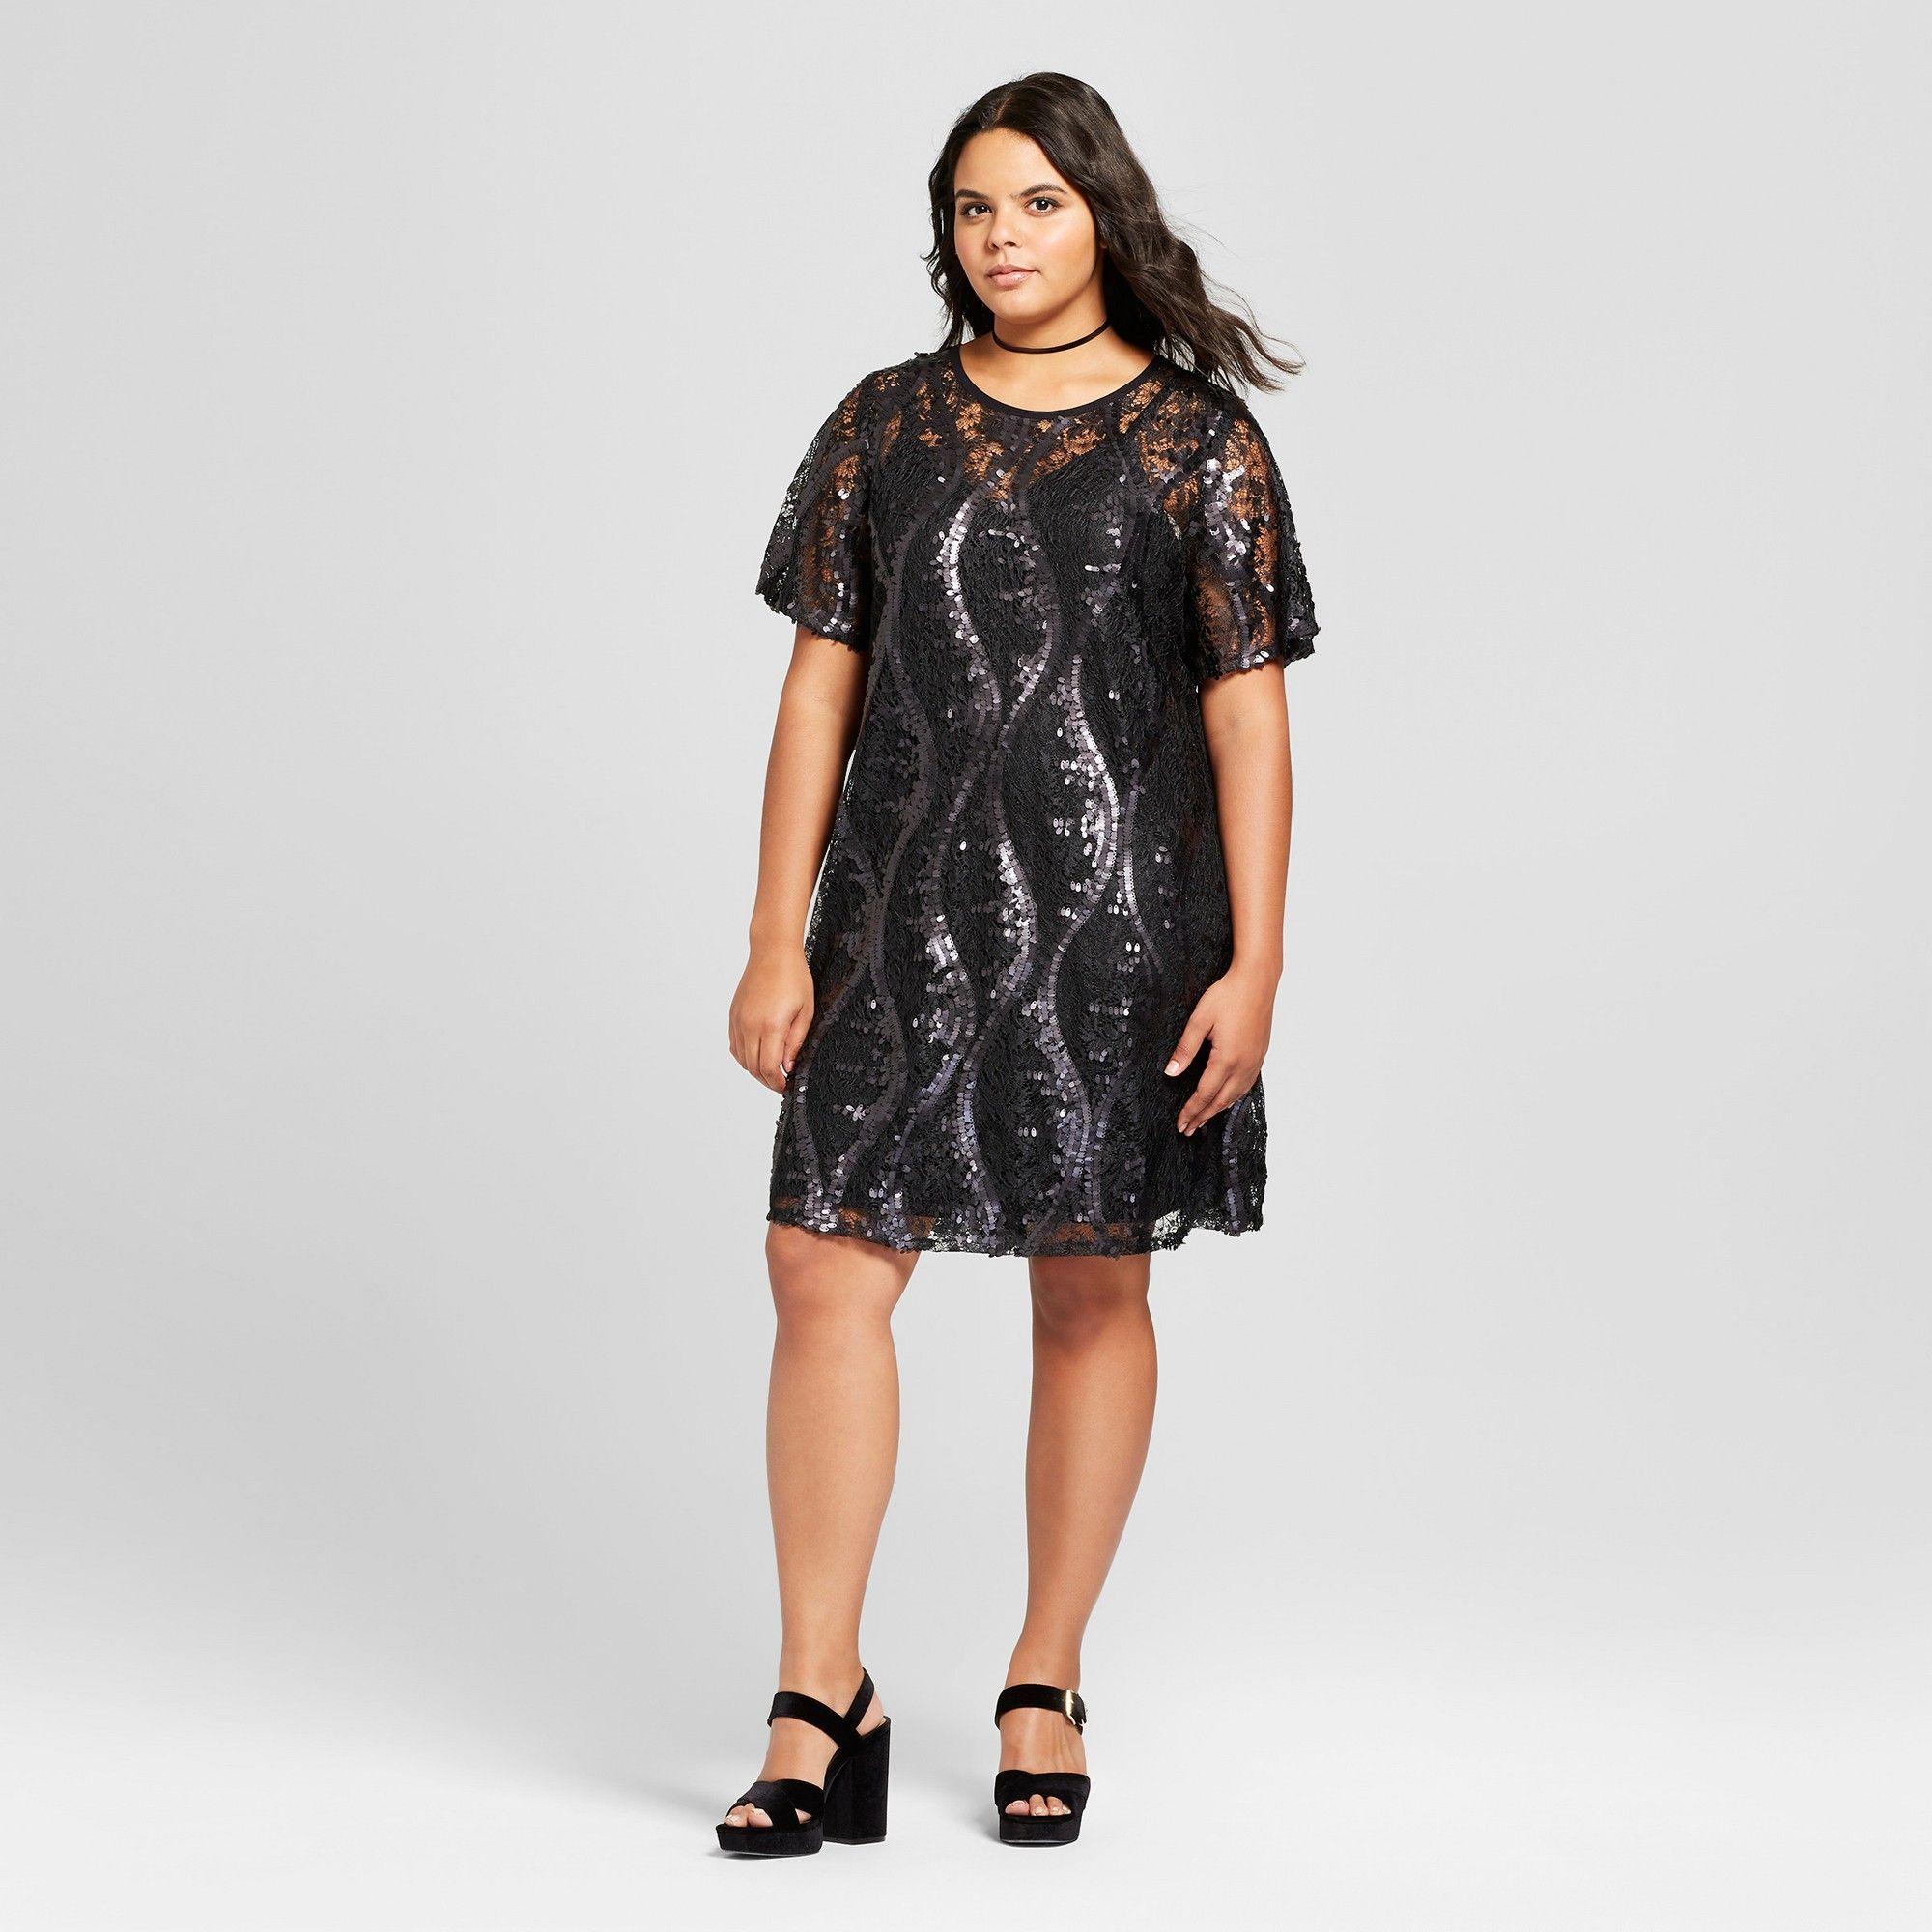 b1ca2b4983d Women s Plus Size Sequin Lace Dress - Xhilaration Black 3X ...